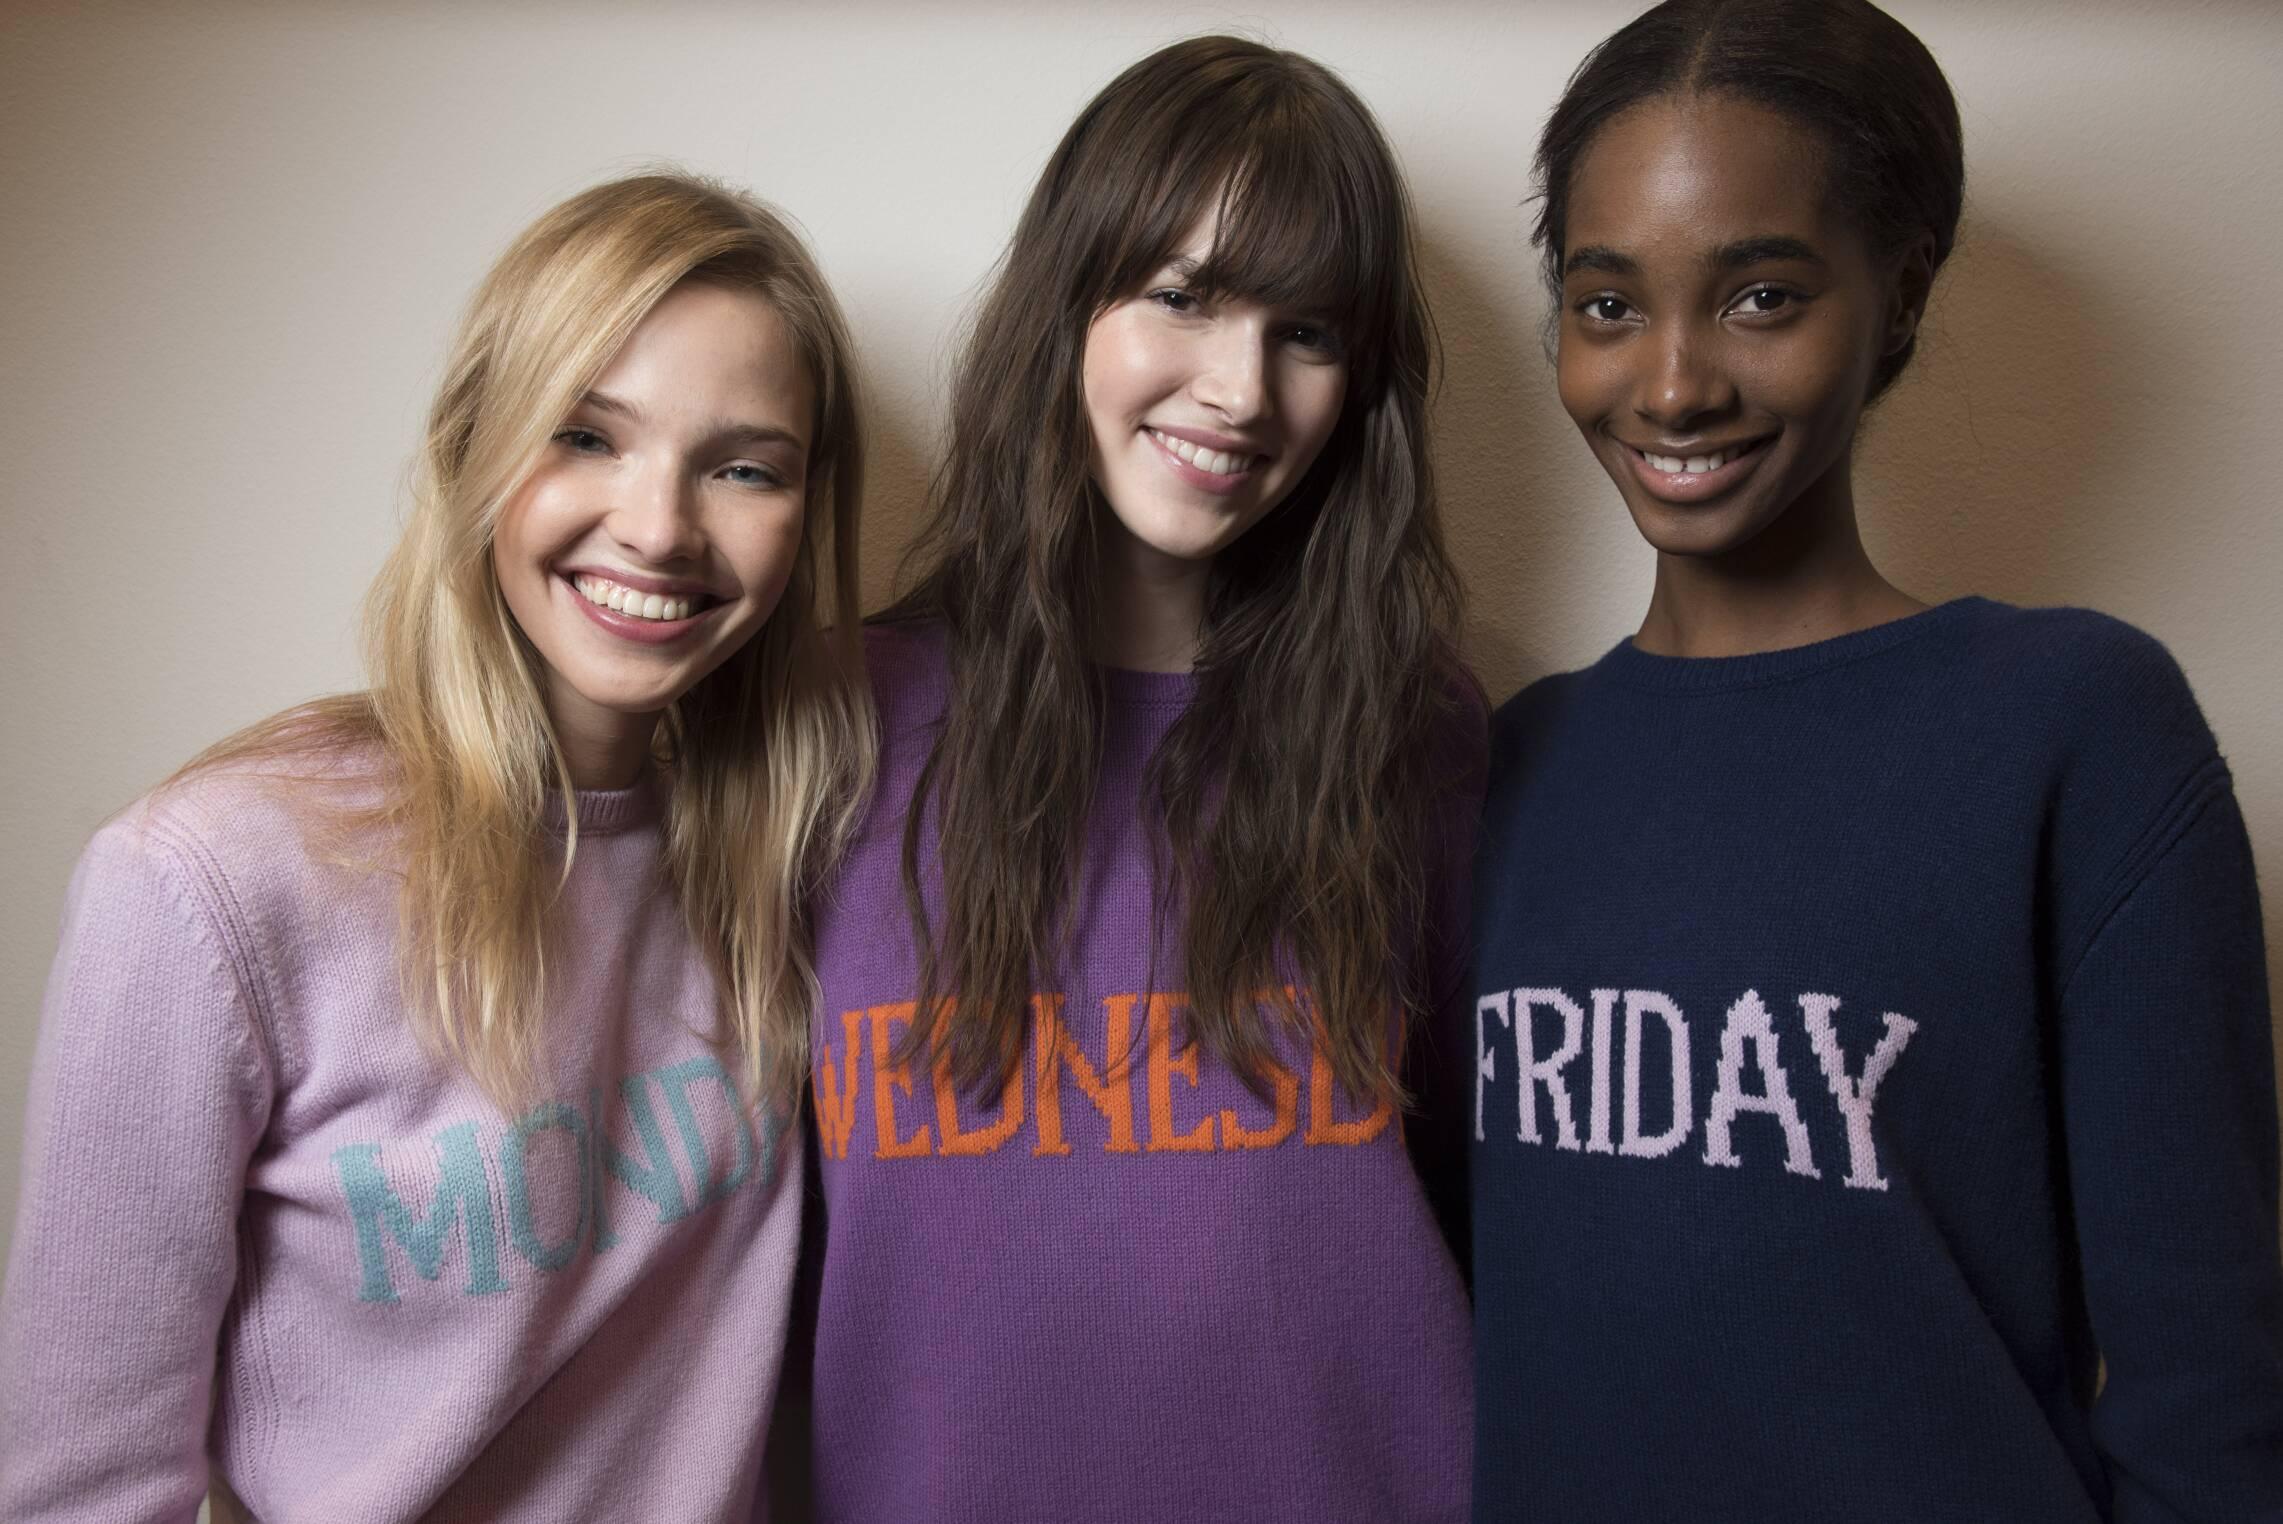 Backstage Alberta Ferretti Models Rainbow Week Collection 2017